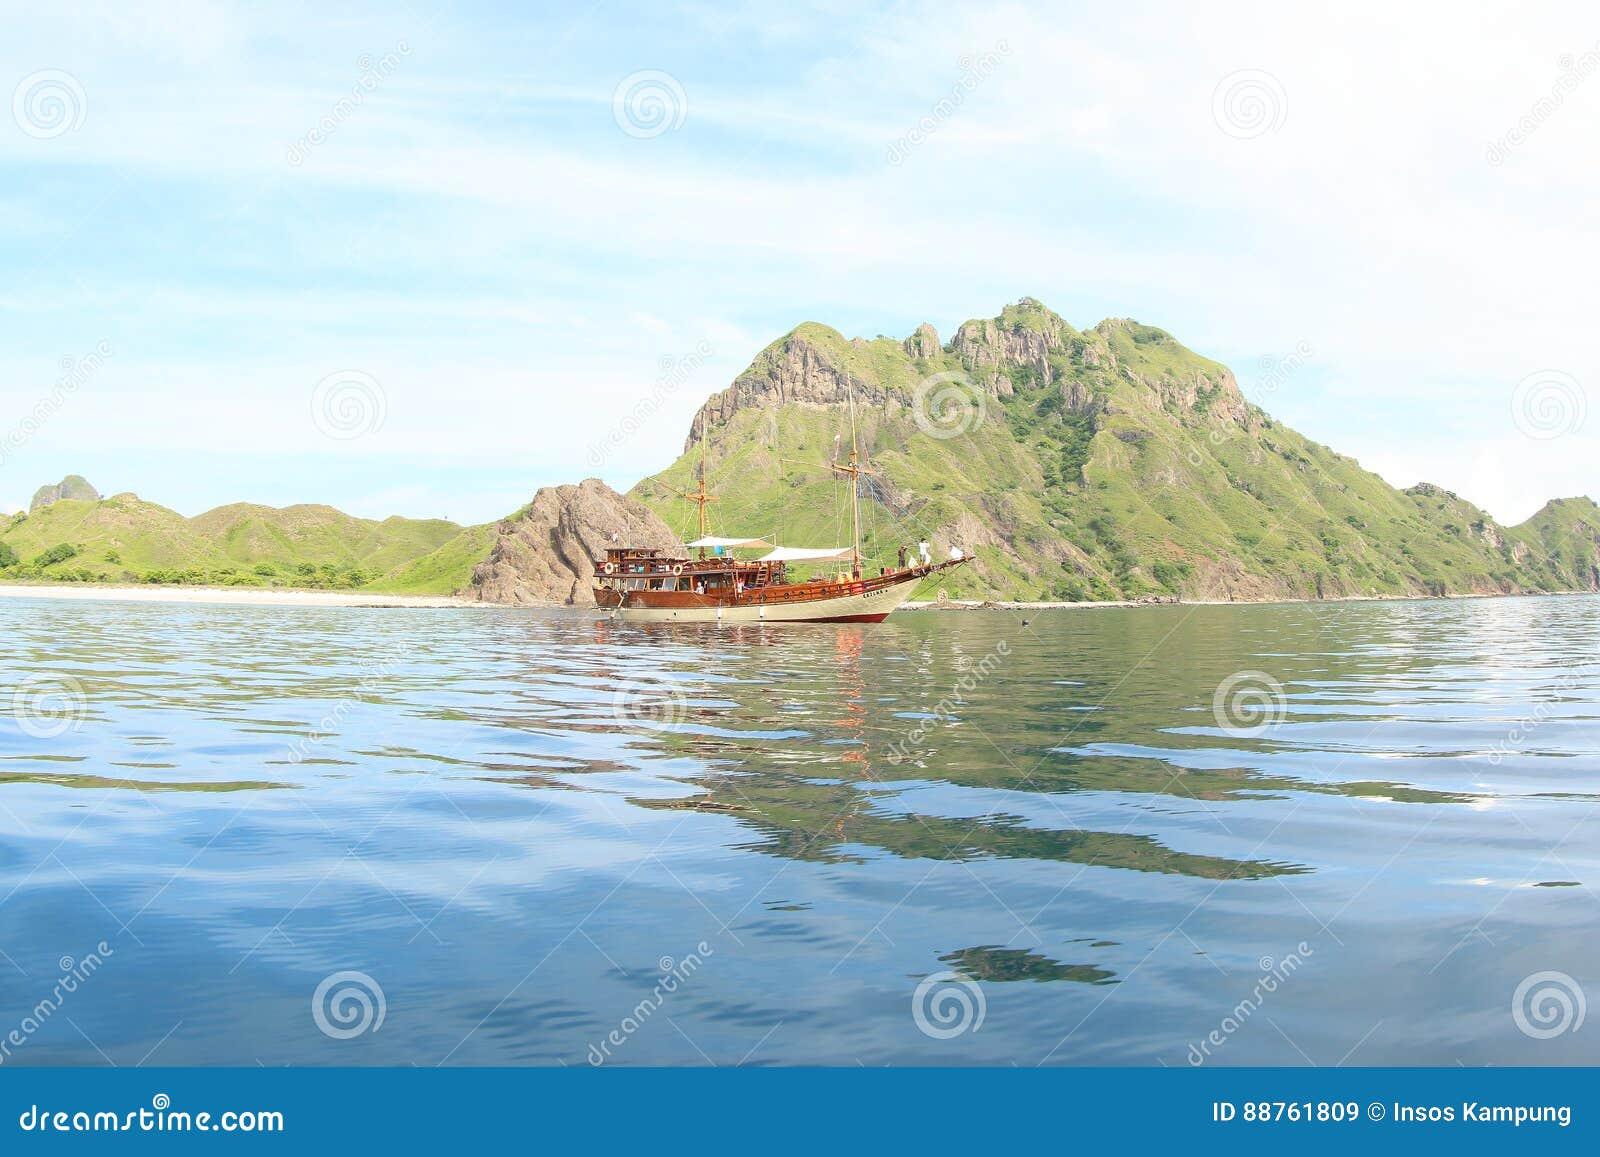 Boat at Padar Island